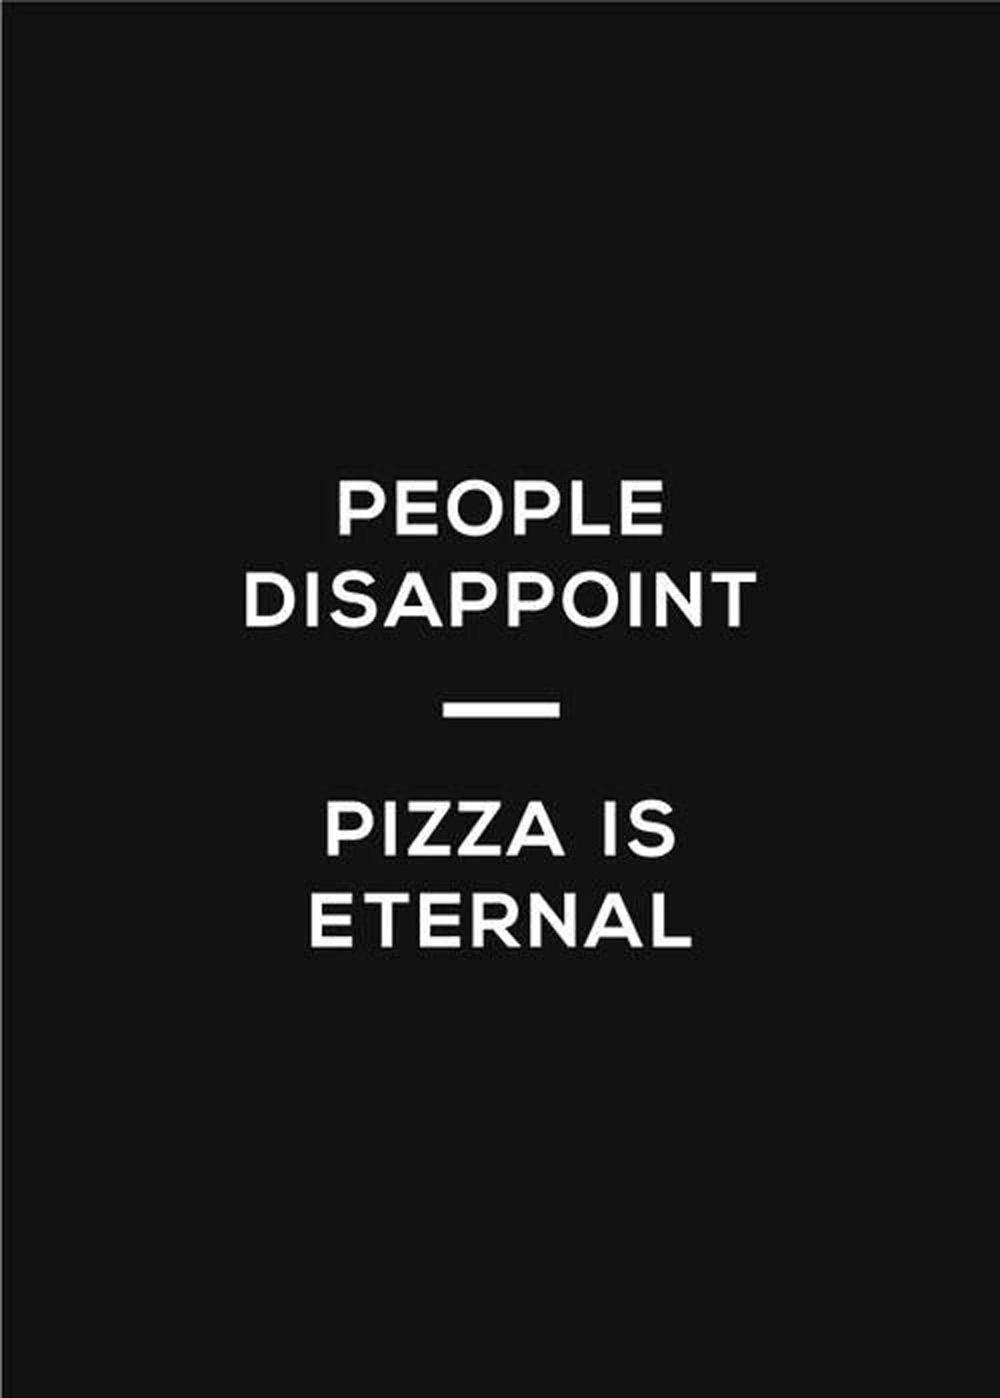 freedom-quotes-pizza